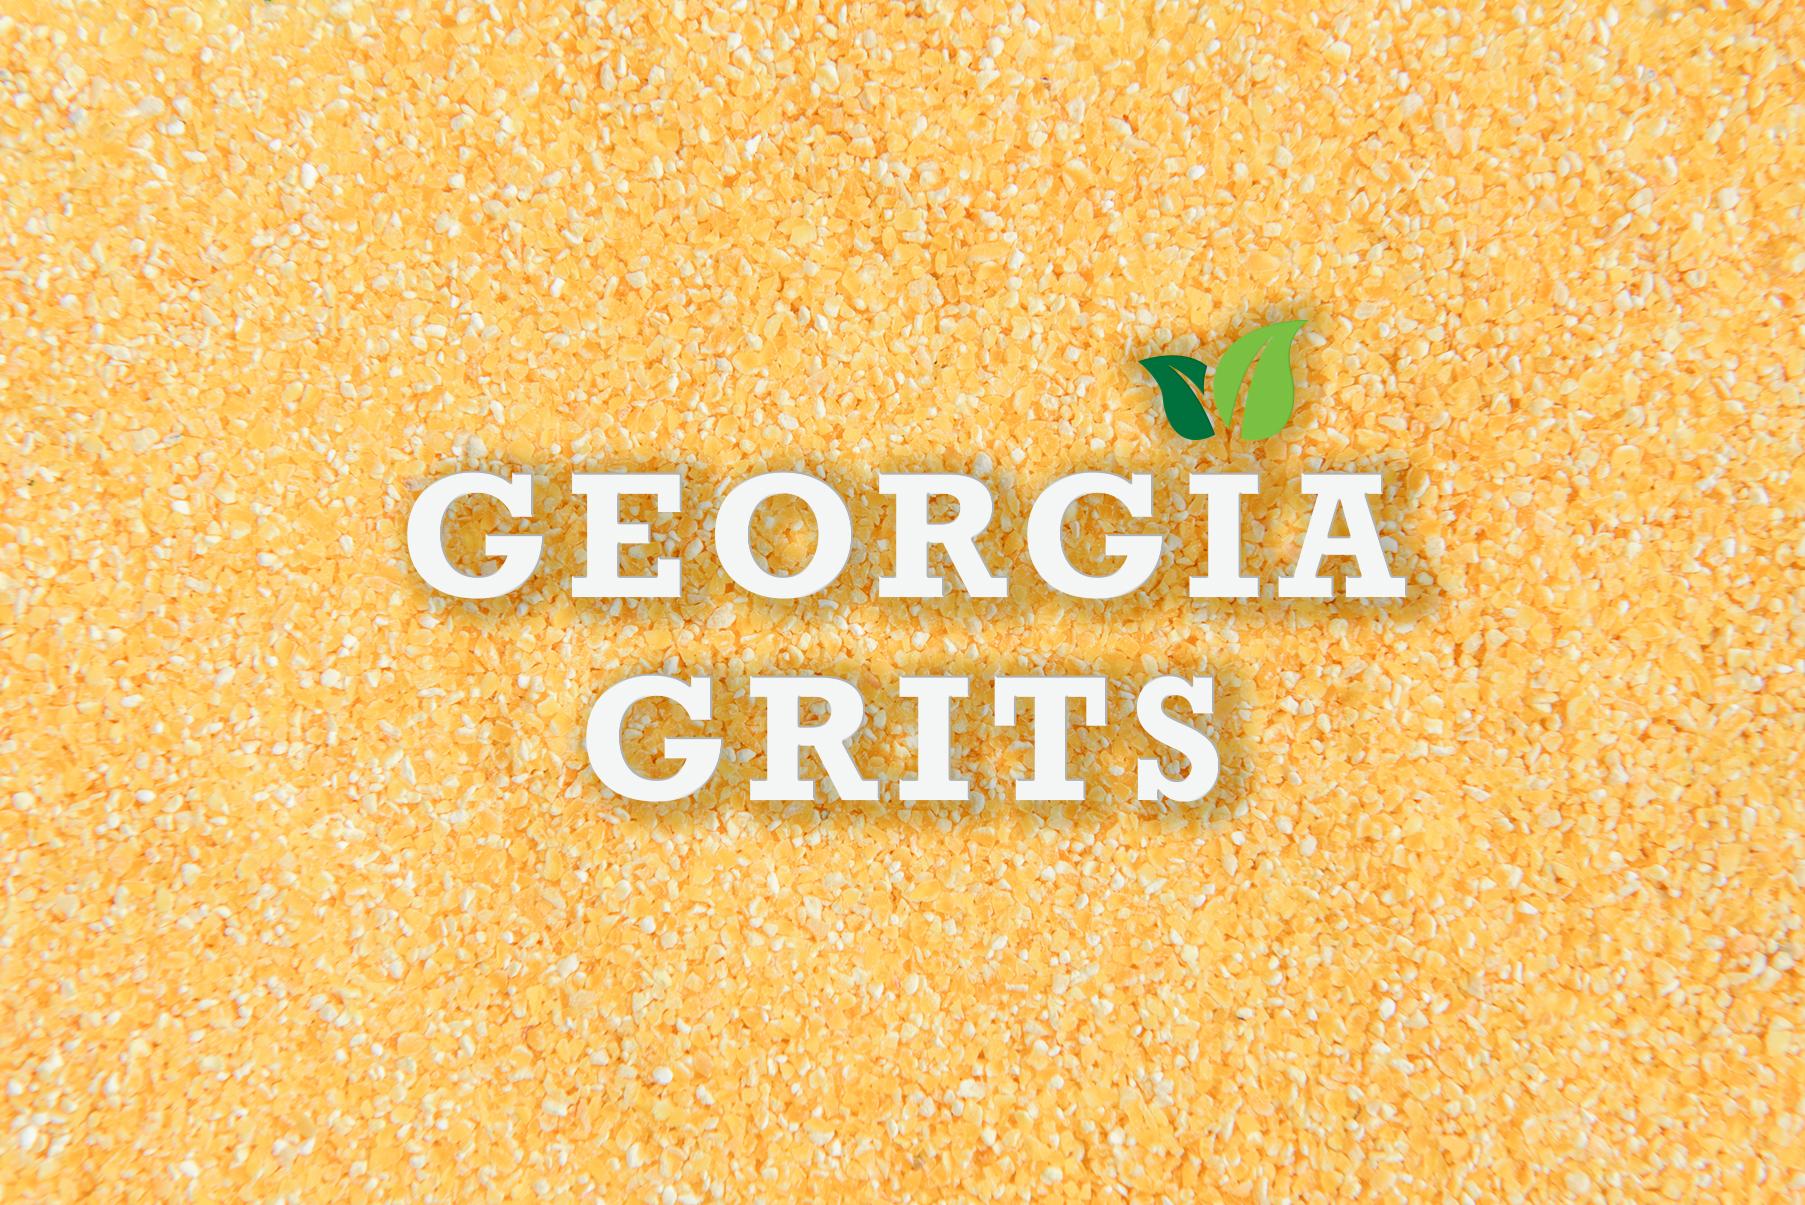 Georgia Grits